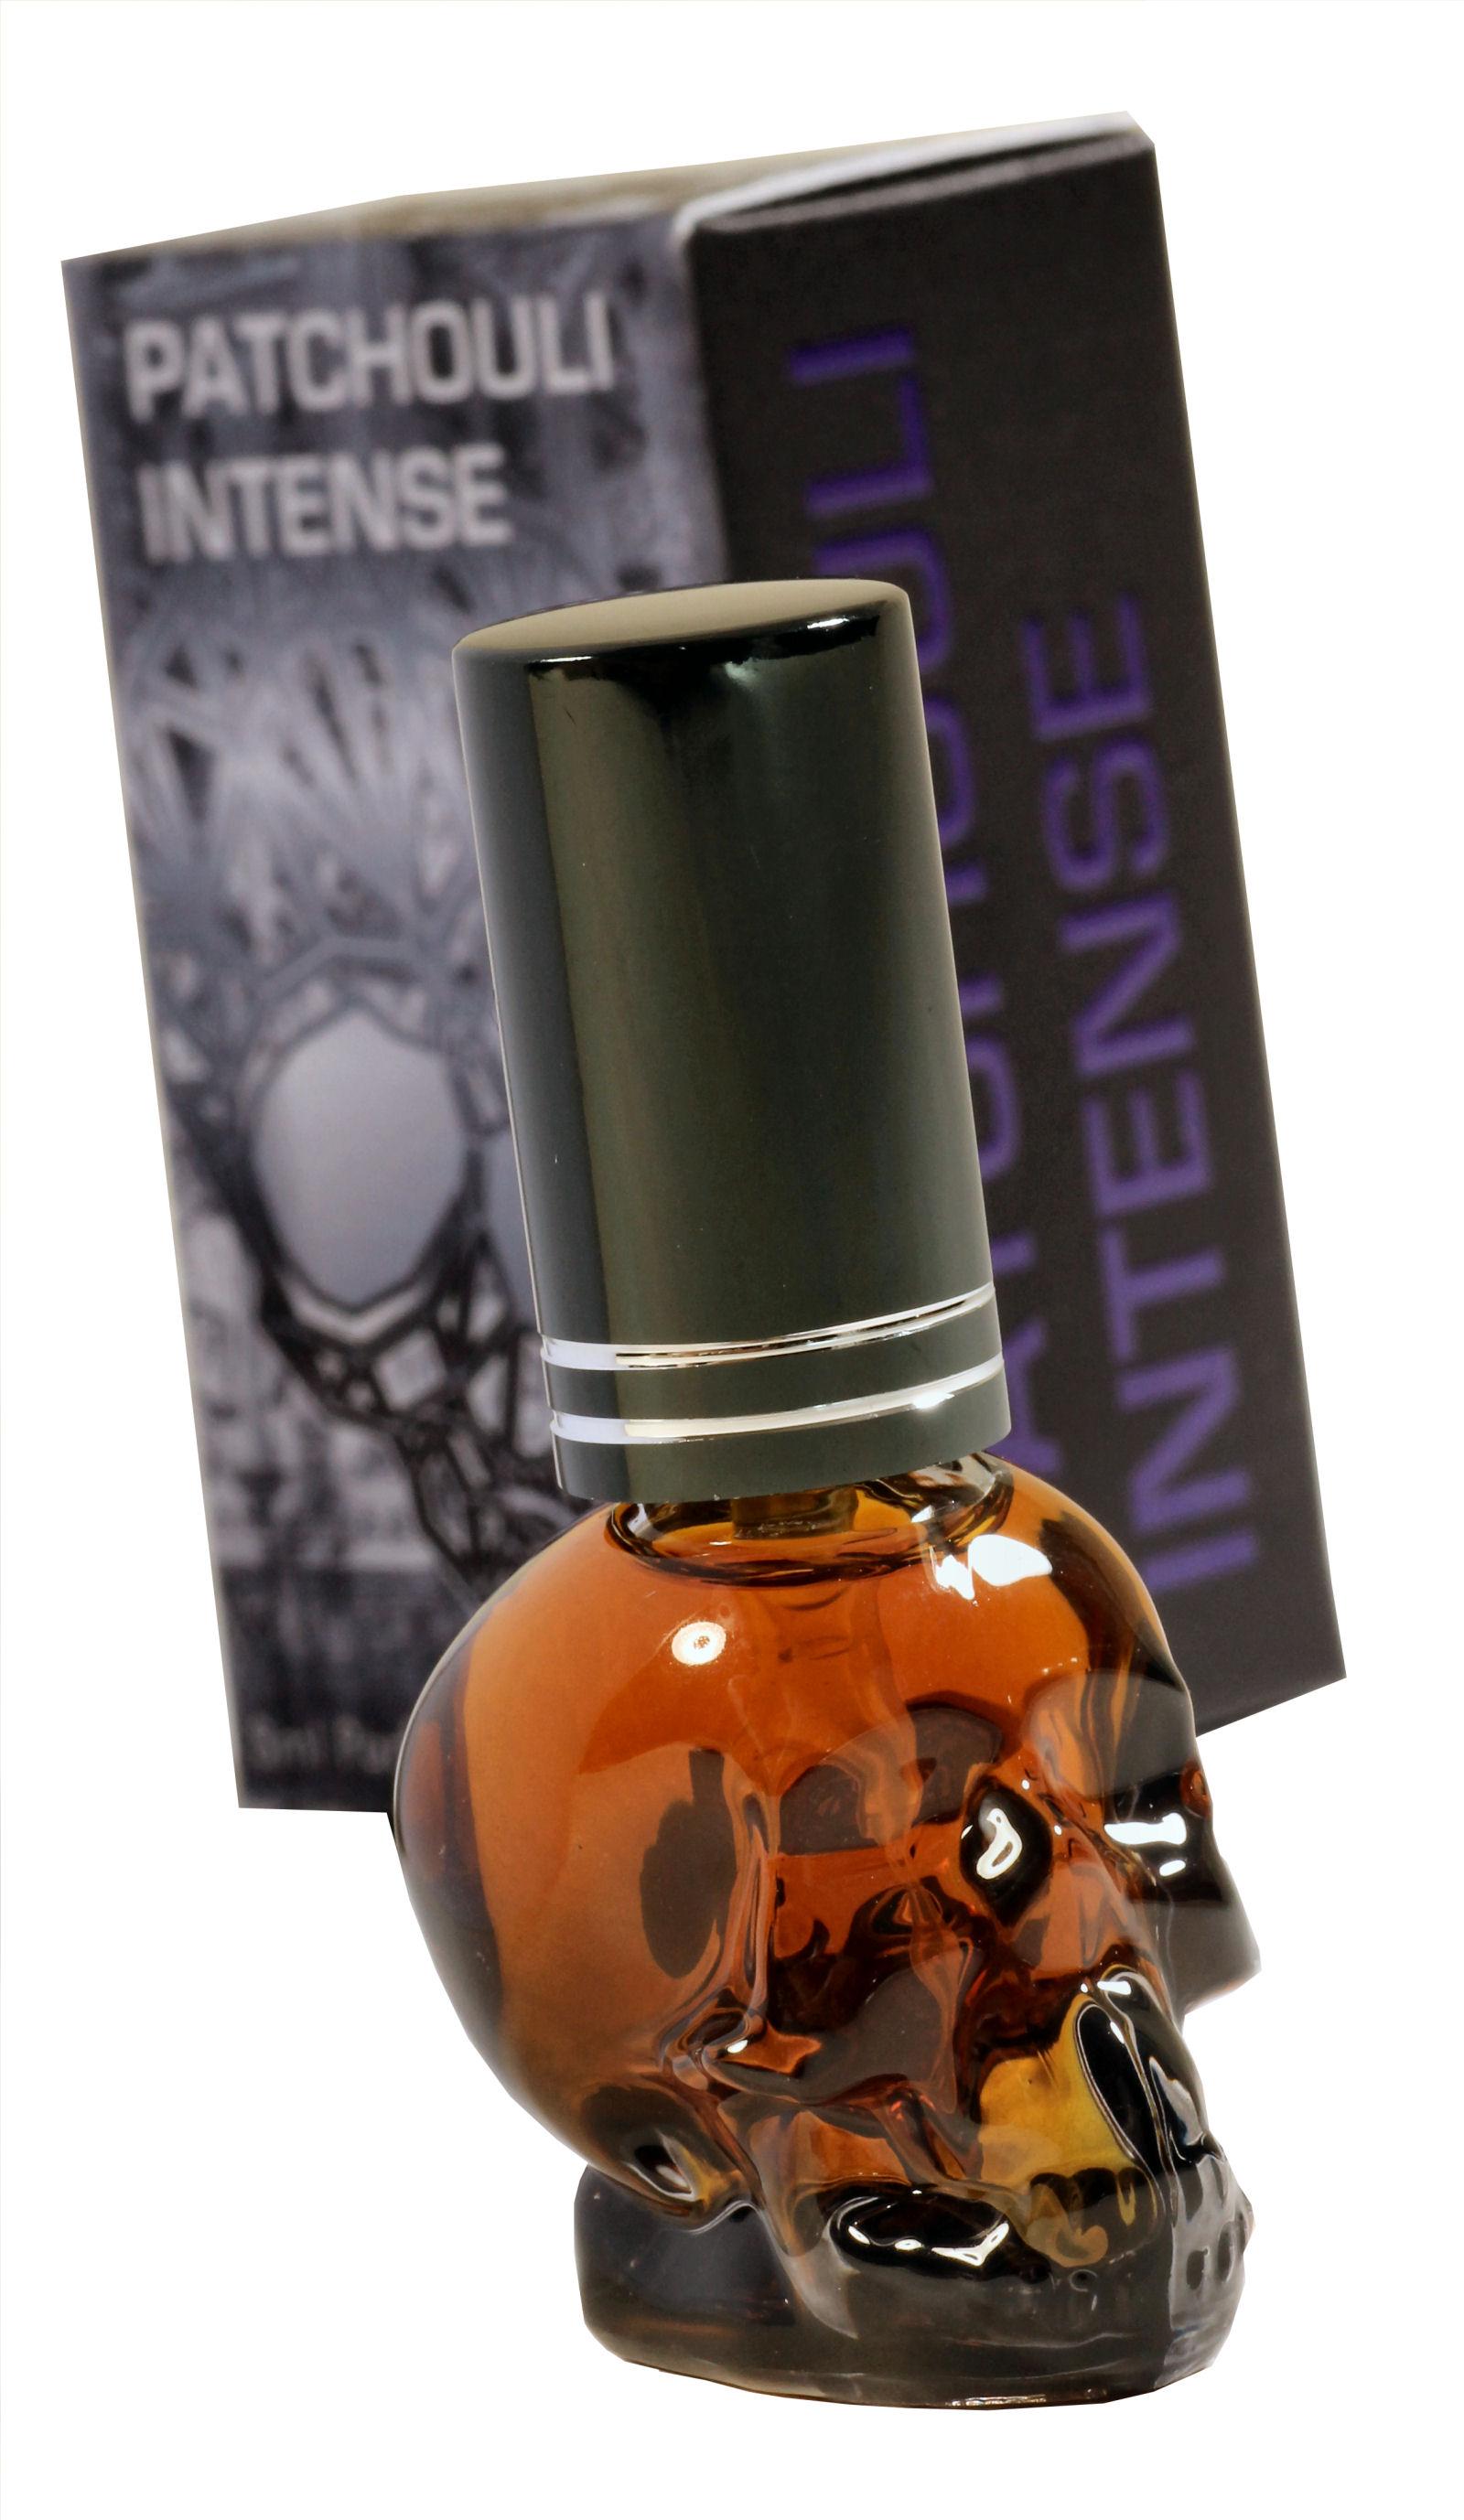 Unser stärkstes Patchouli! Patchouli Parfum Intense im süßen Skull - Mini-Flakon. Extrem stark, lang anhaltend